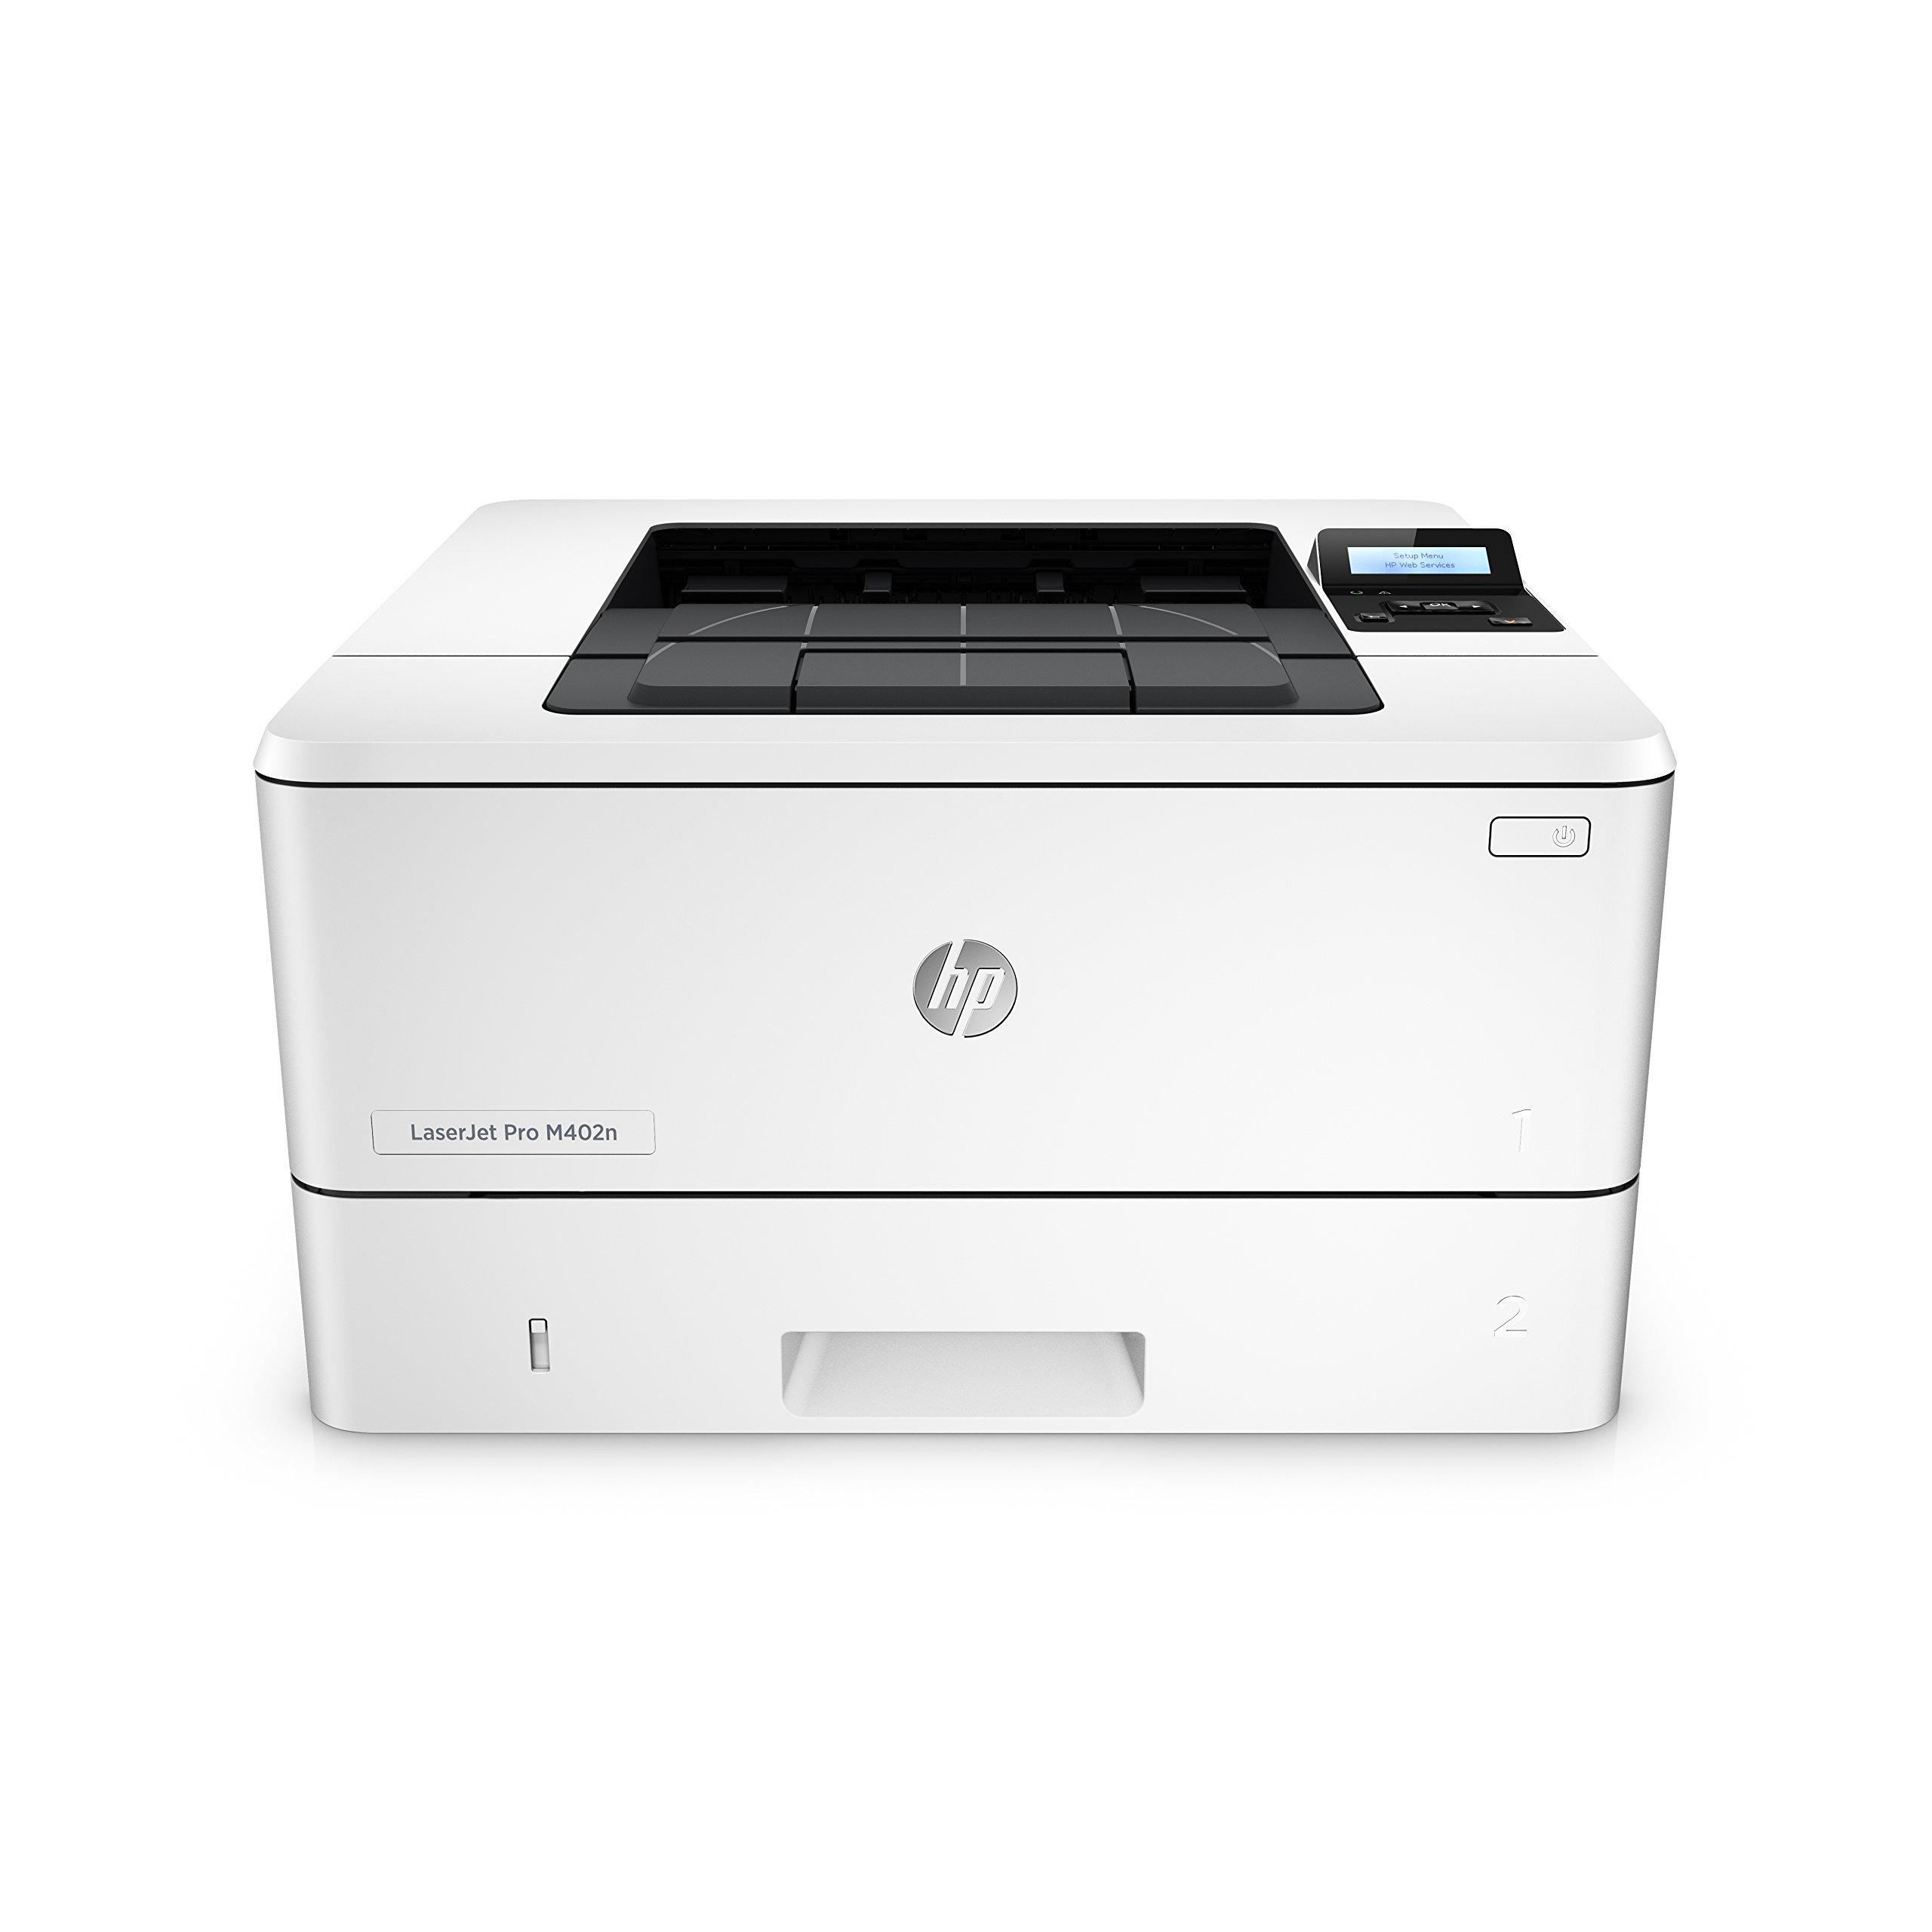 HP Laserjet Pro M402n Monochrome Printer, (C5F93A) (Renewed) by HP (Image #1)